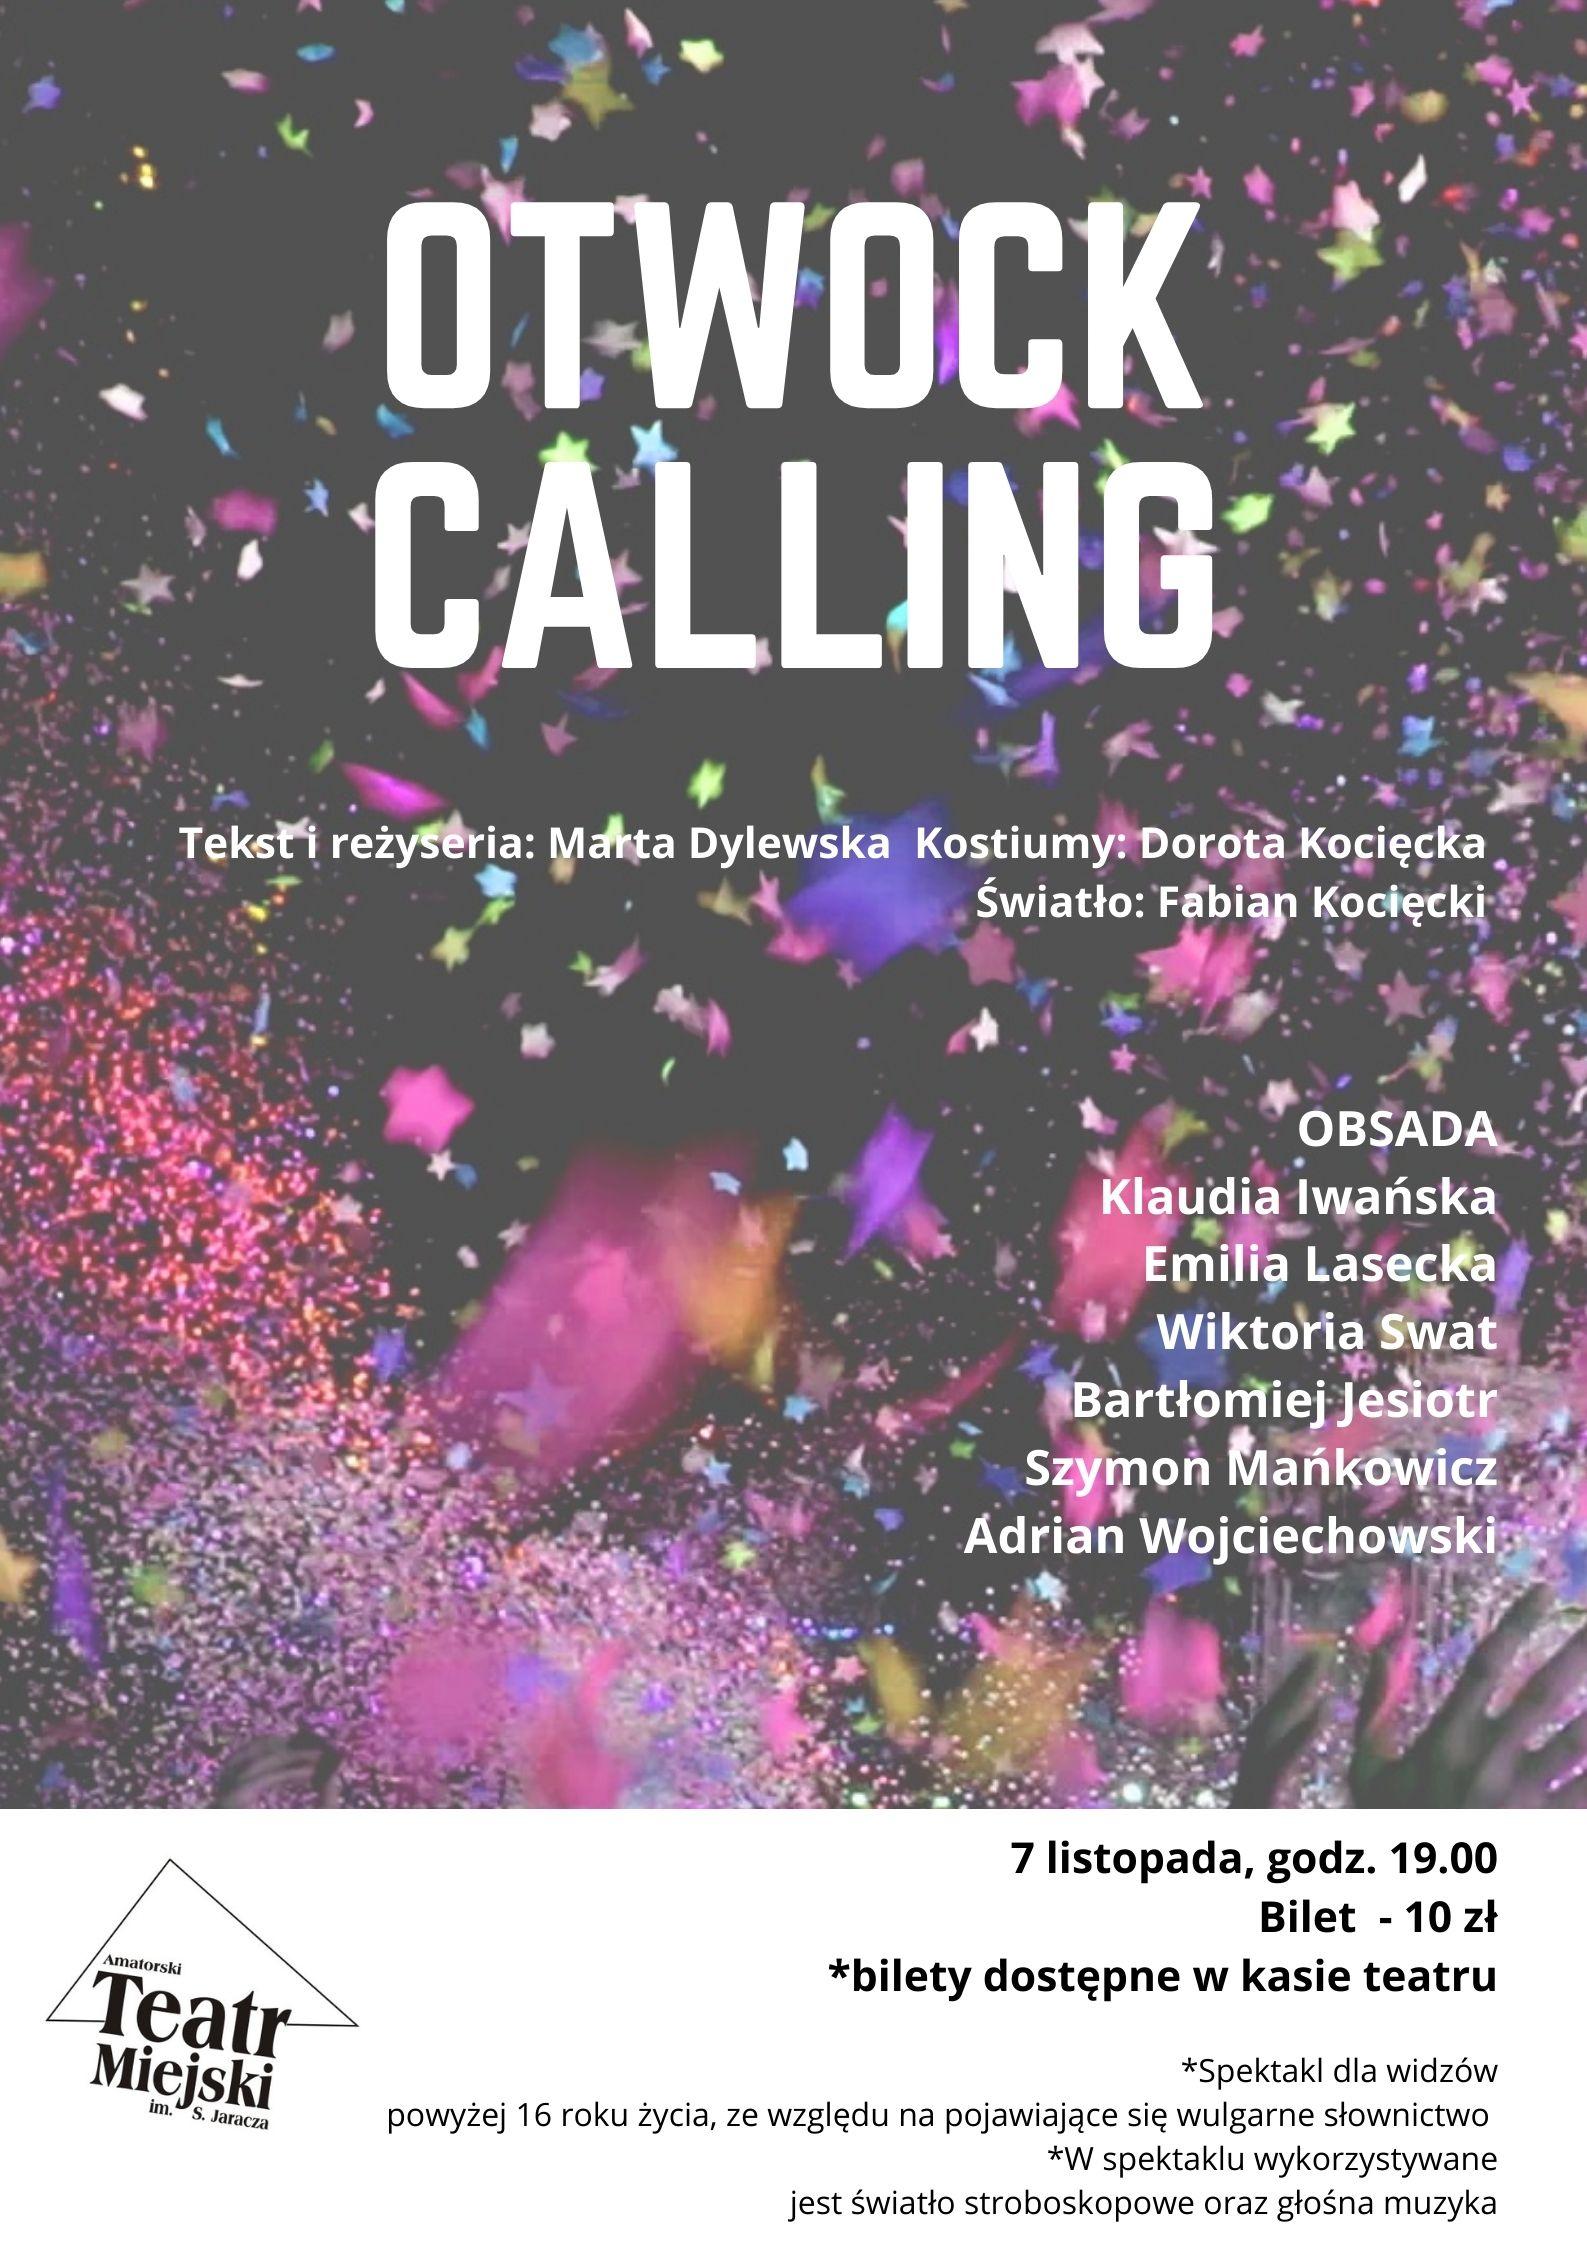 Otwock Calling